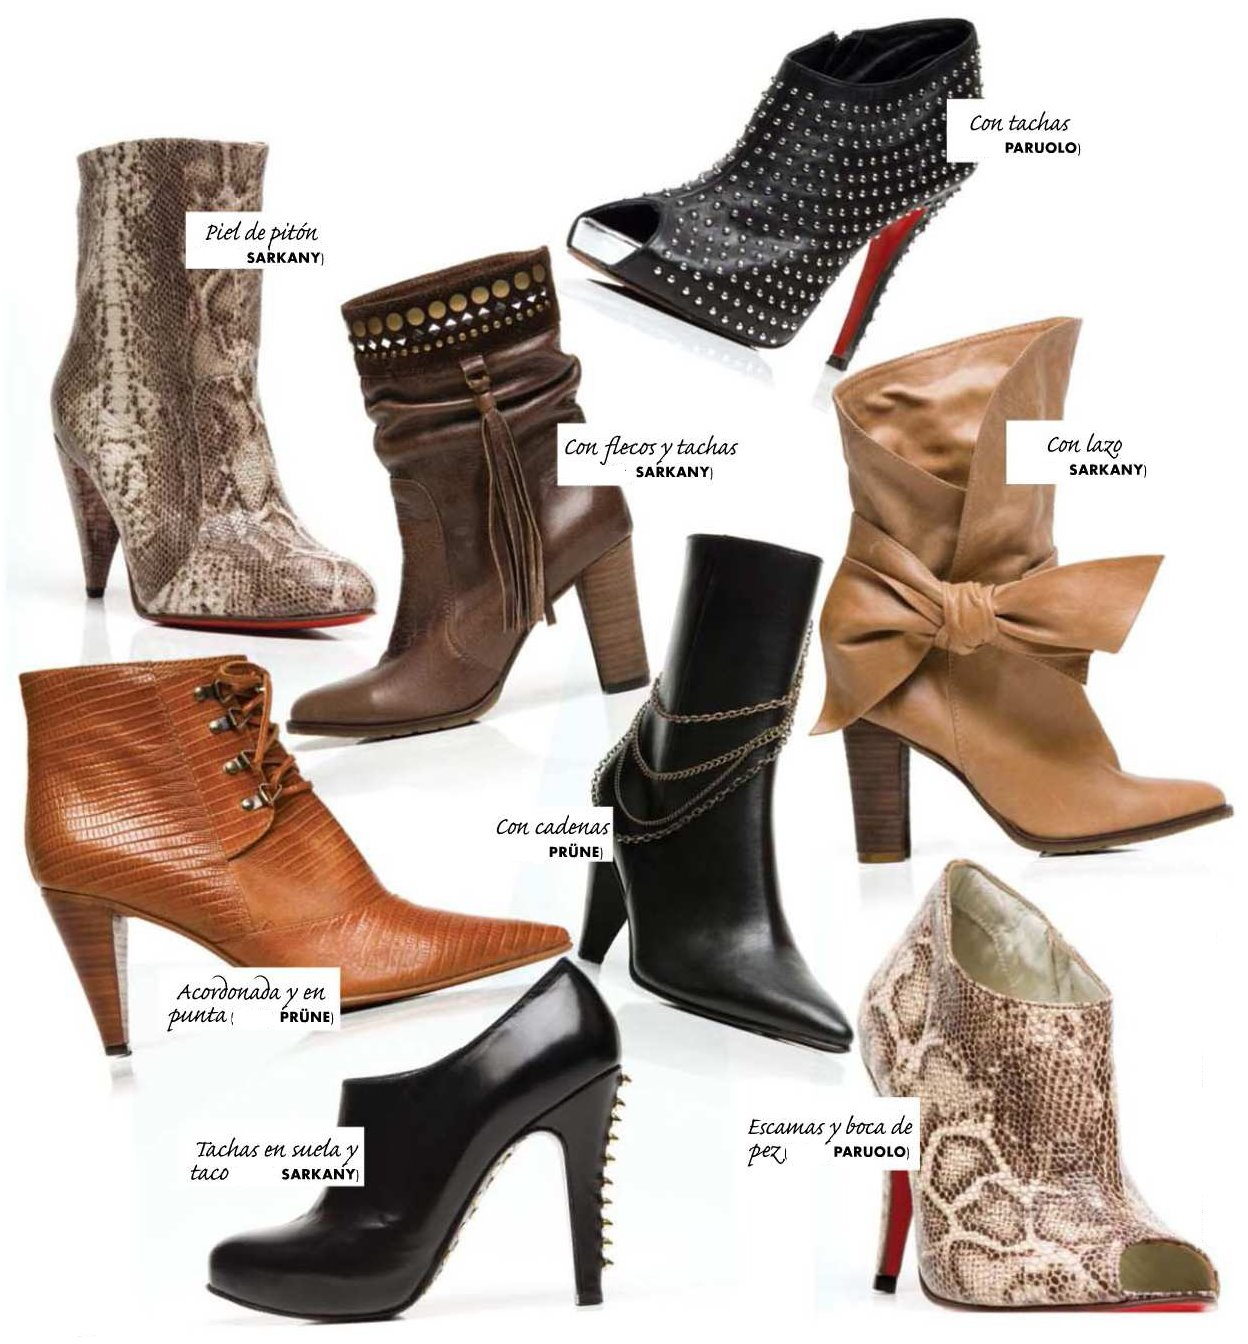 https://i2.wp.com/3.bp.blogspot.com/_hLJlfG3YyWo/Smo33oNofoI/AAAAAAAAEI8/rWzmXs1CJ7M/s1600/zapatos05.jpg